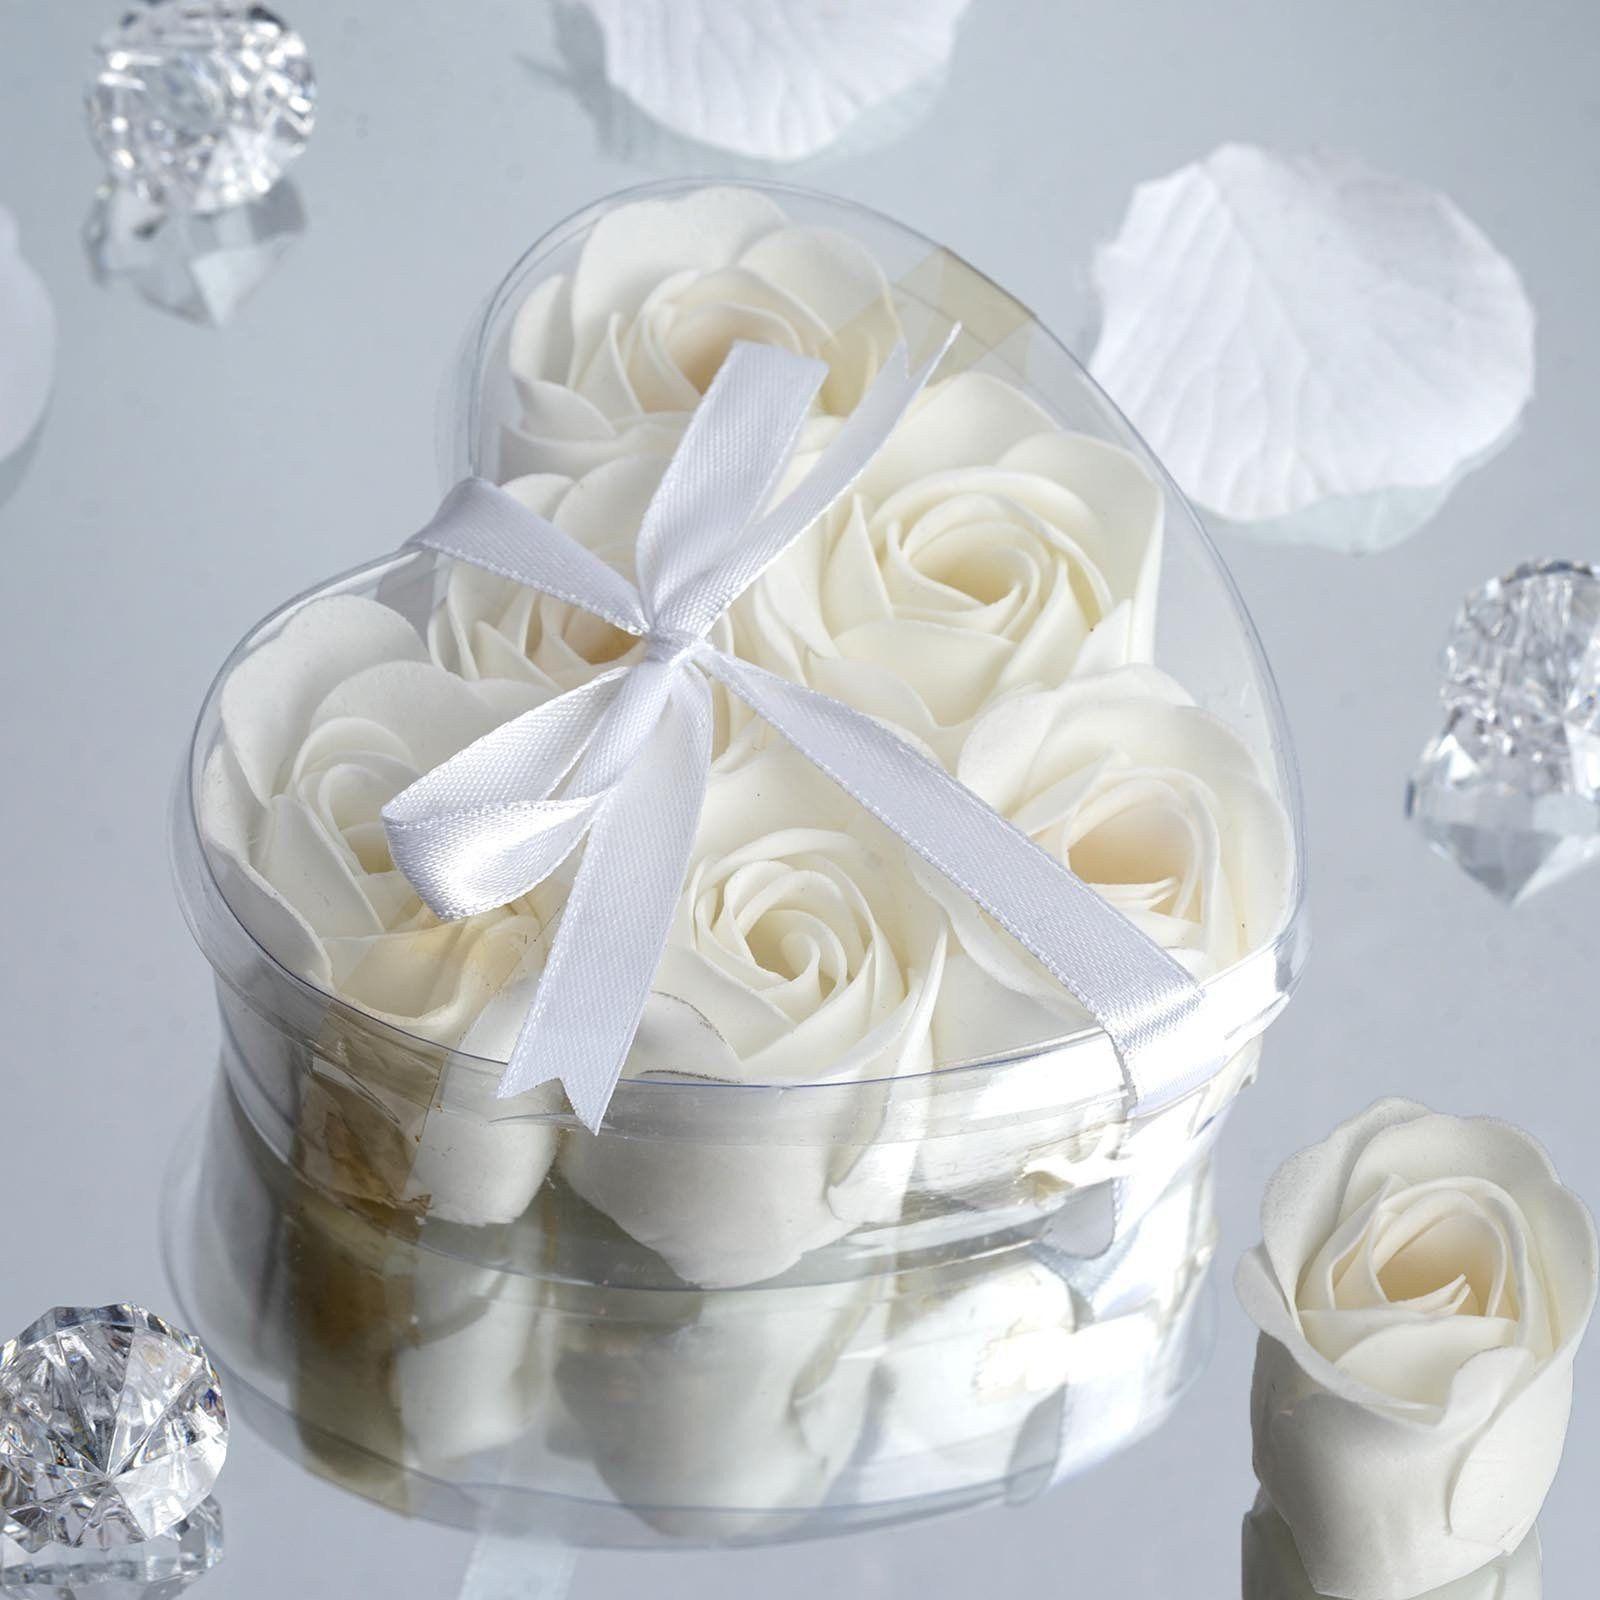 White Heart Rose Flower Petal Soap Favor Wedding Decoration Party ...